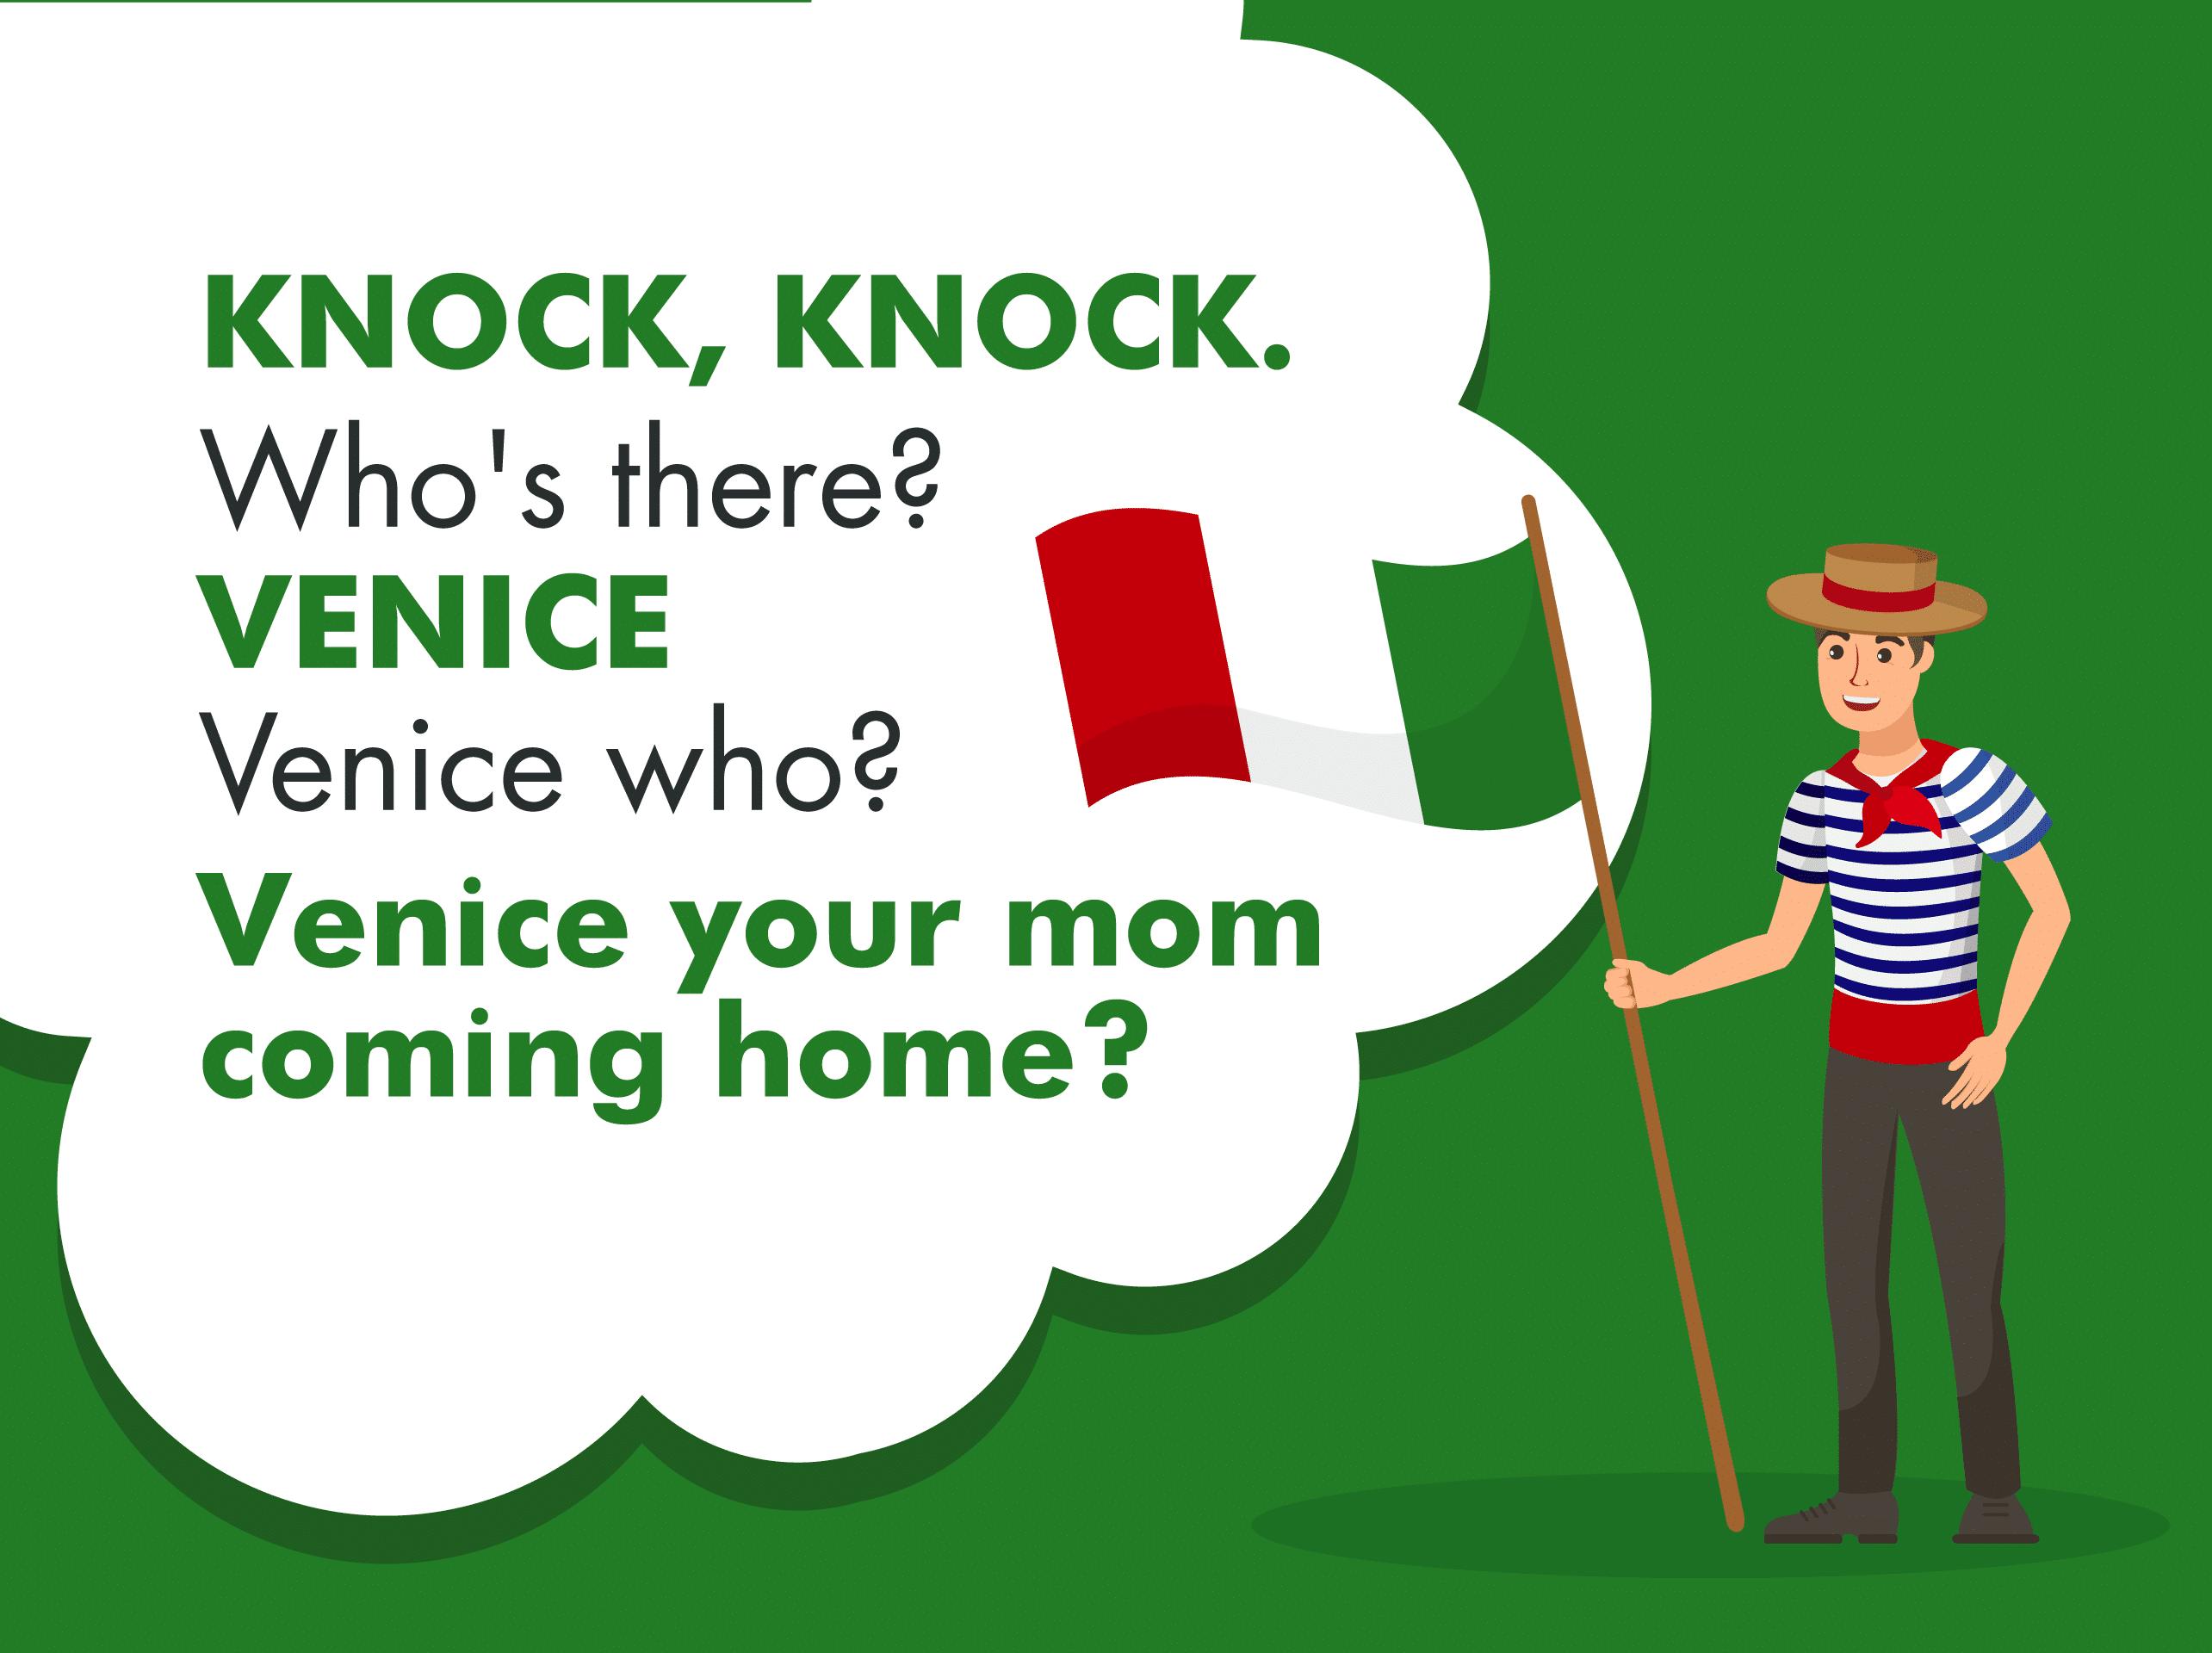 A graphic illustrating a Venice knock knock joke for kids.